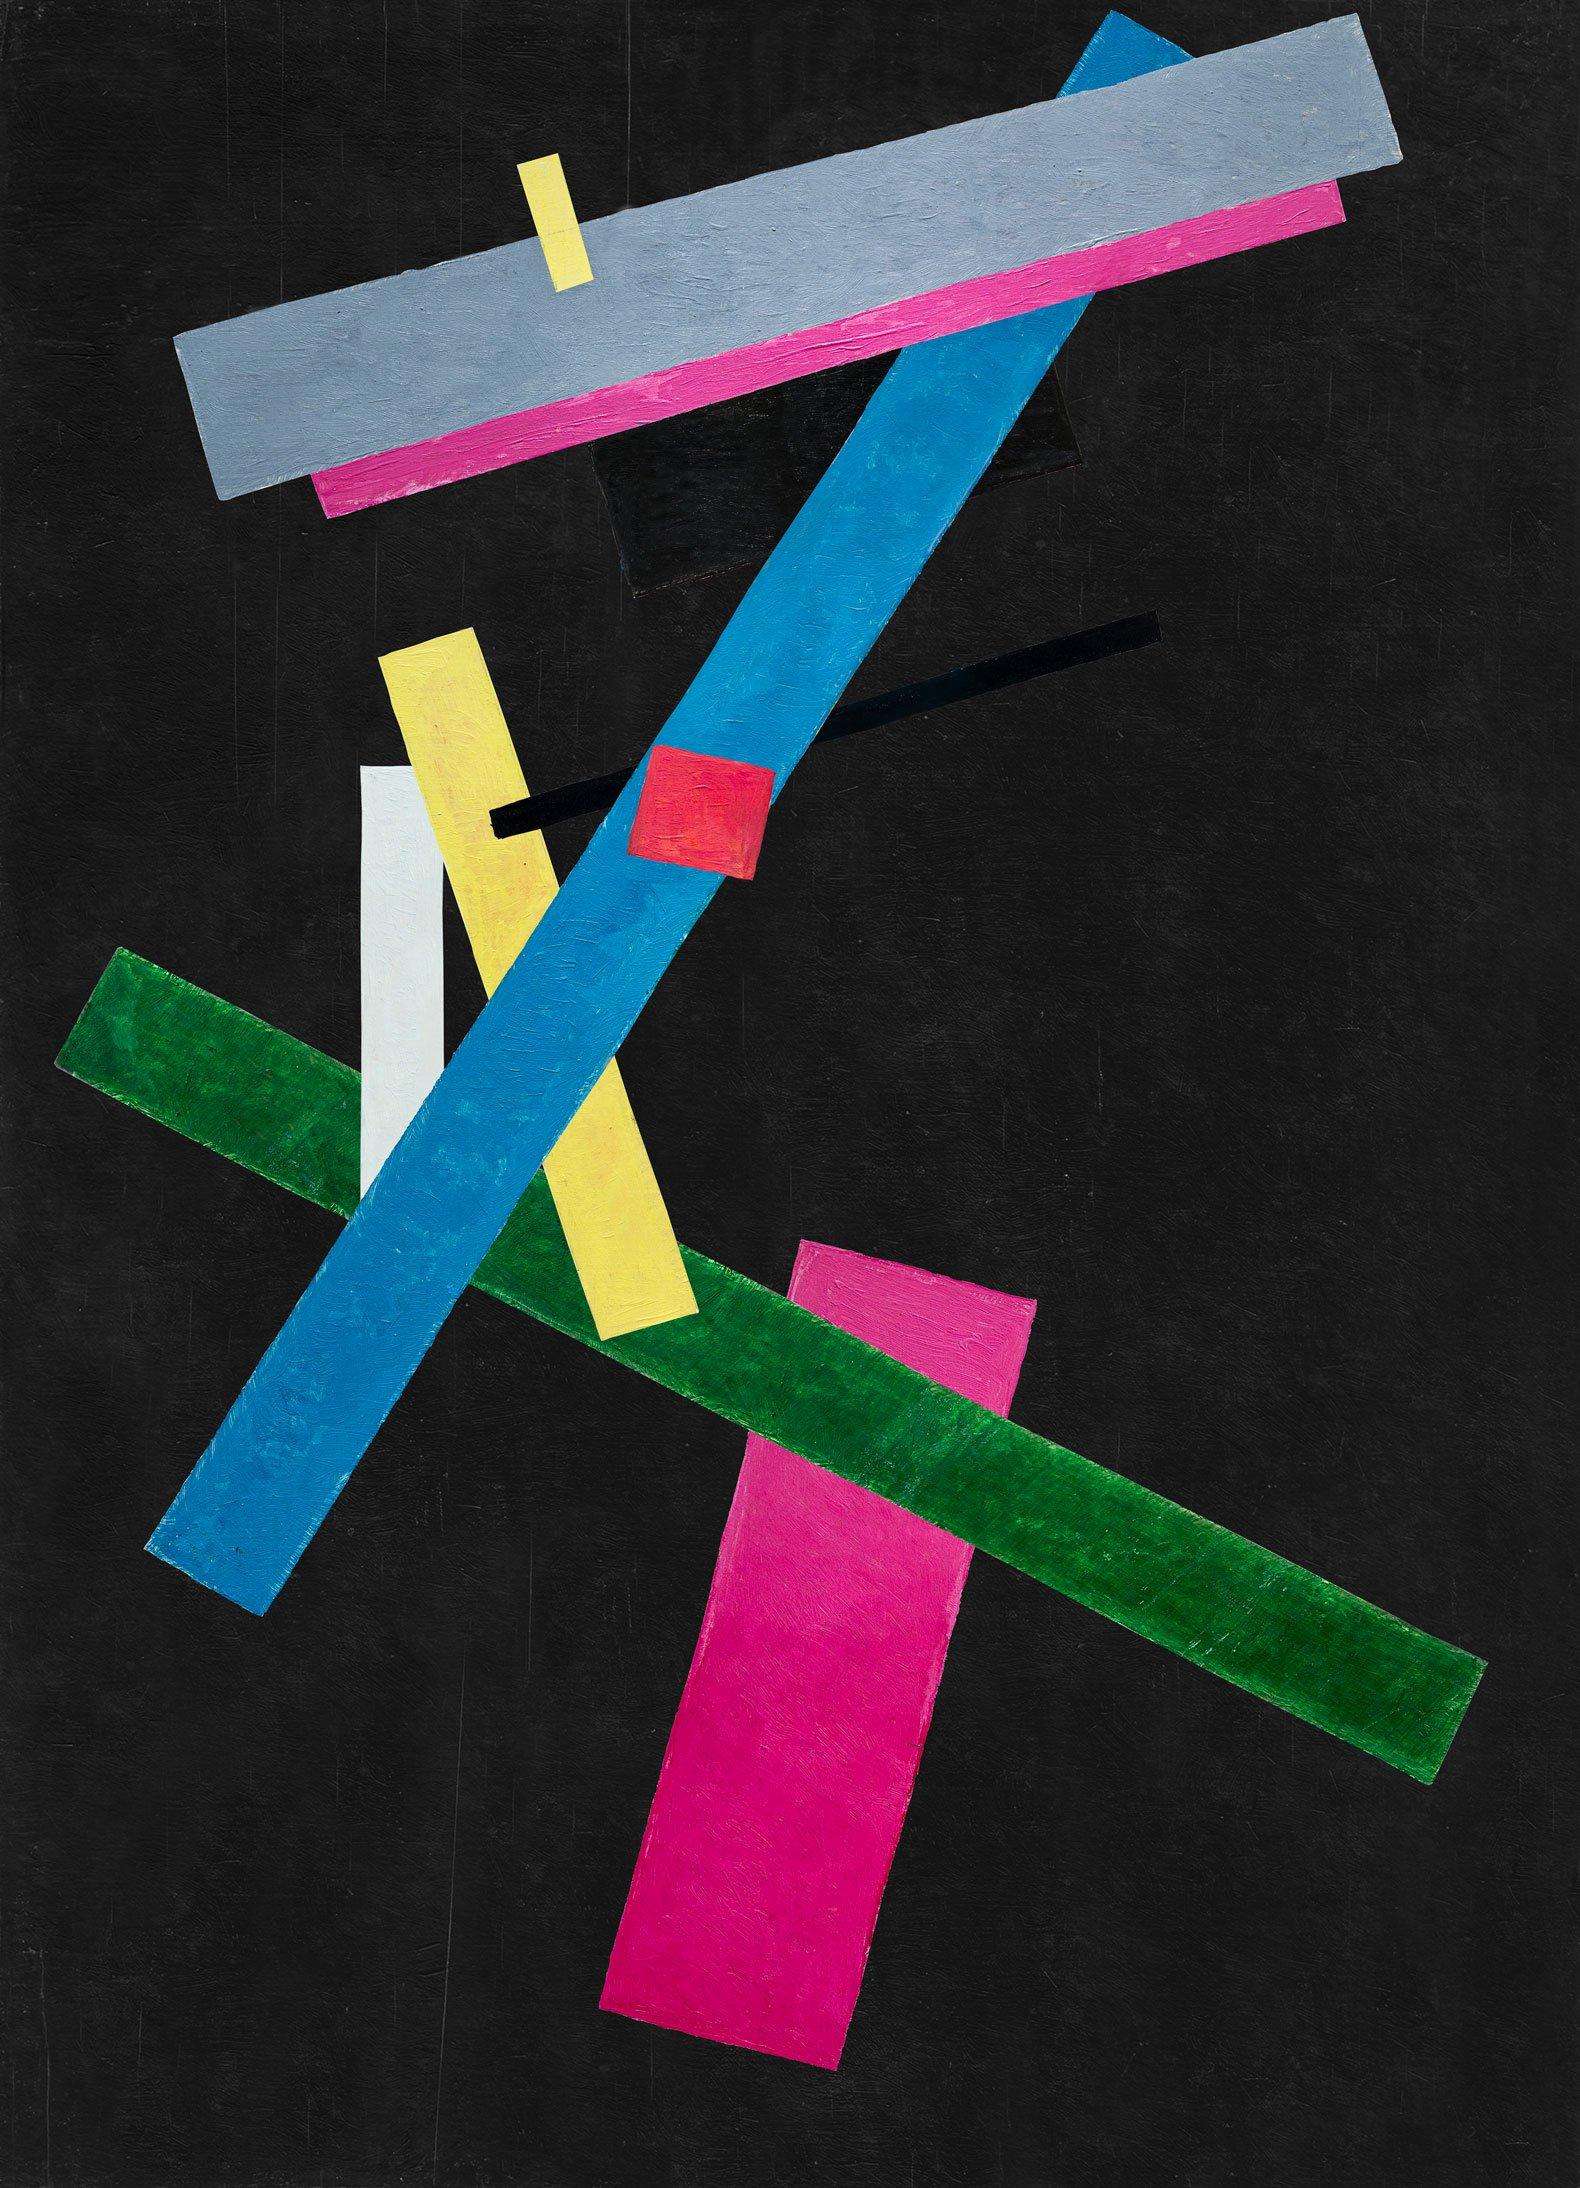 """Variaciones a partir de Malevich"" an exhibition by José Manuel Ballester at Ivorypress © José Manuel Ballester"